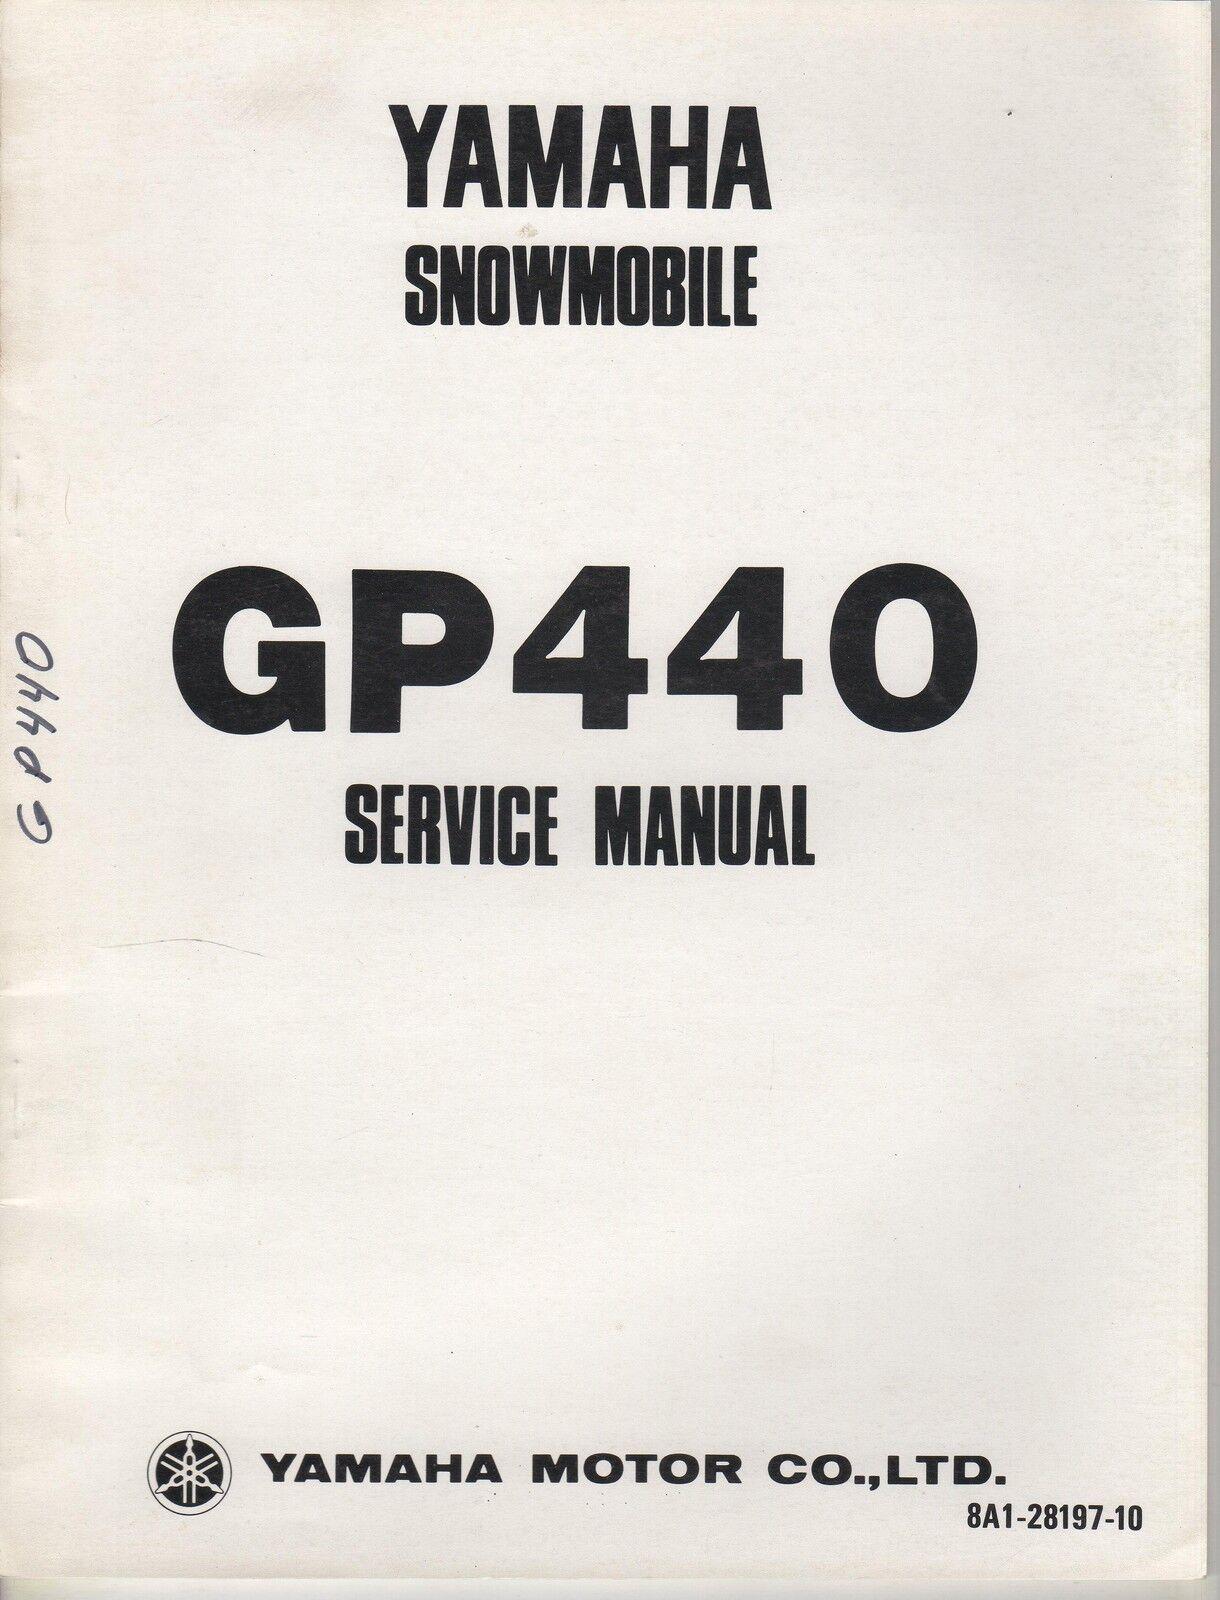 1976 YAMAHA SNOWMOBILE GP440 SERVICE MANUAL (581)